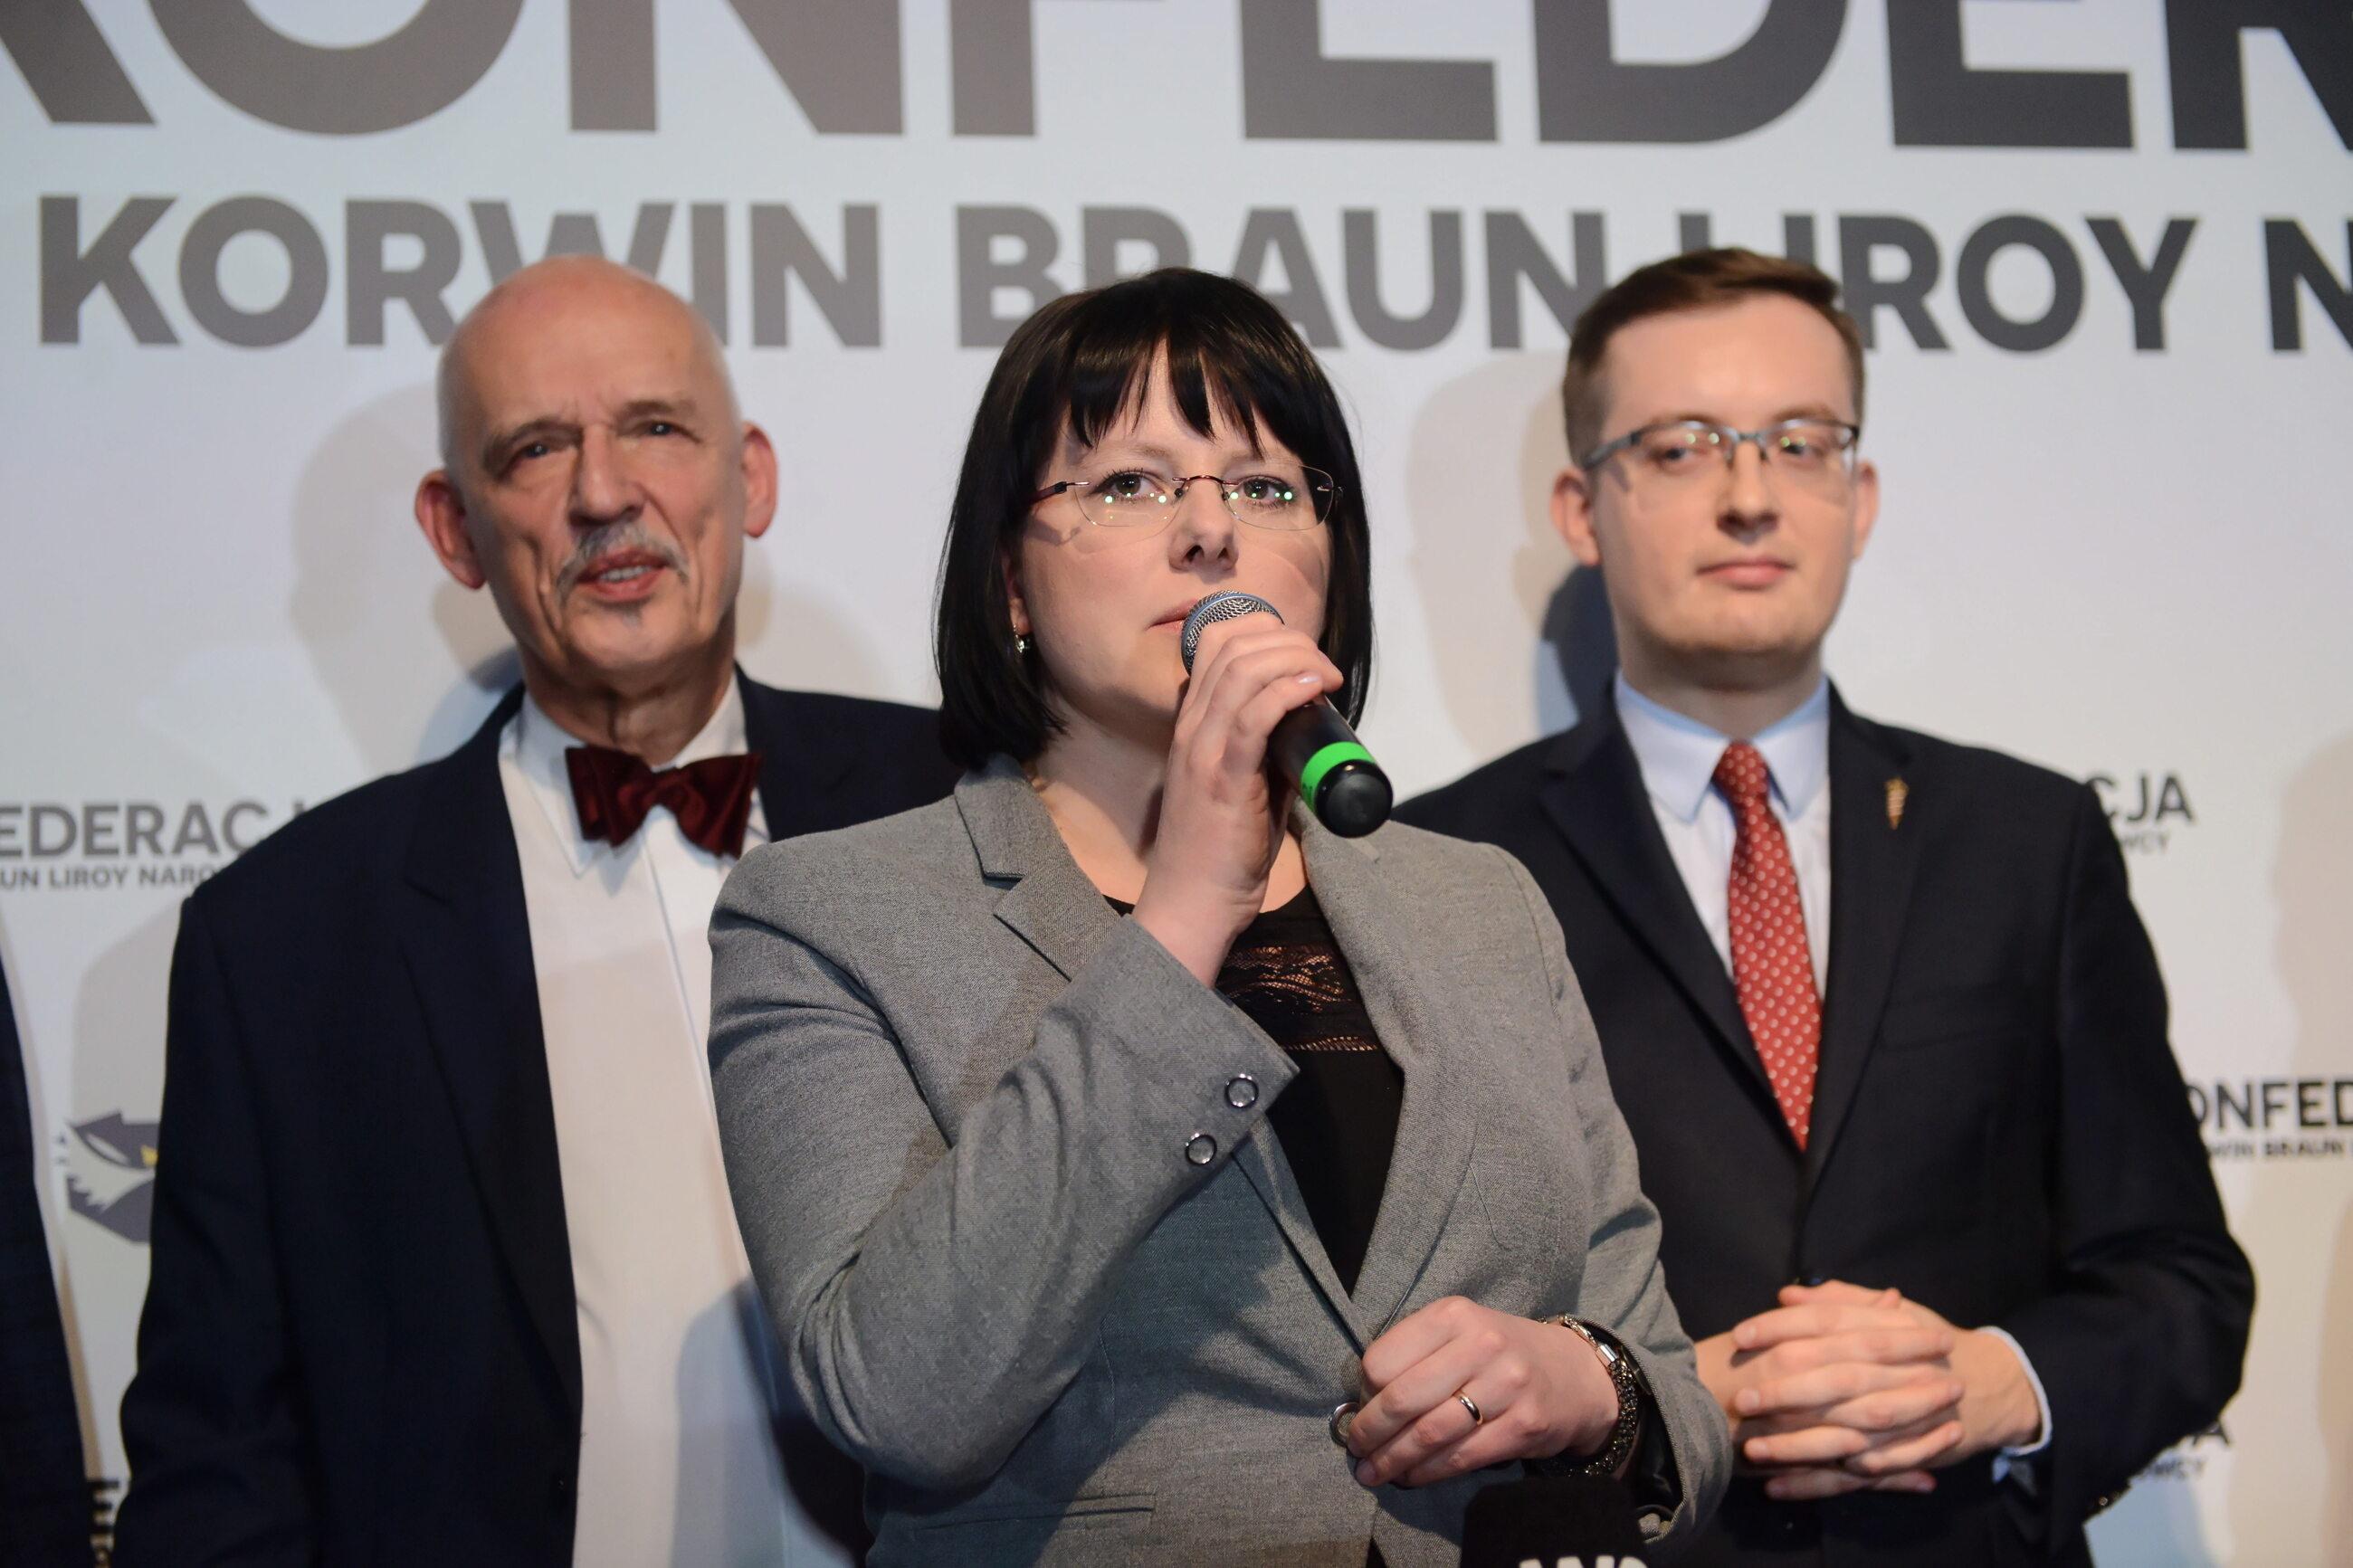 Janusz Korwin-Mikke, Kaja Godek, Robert Winnicki